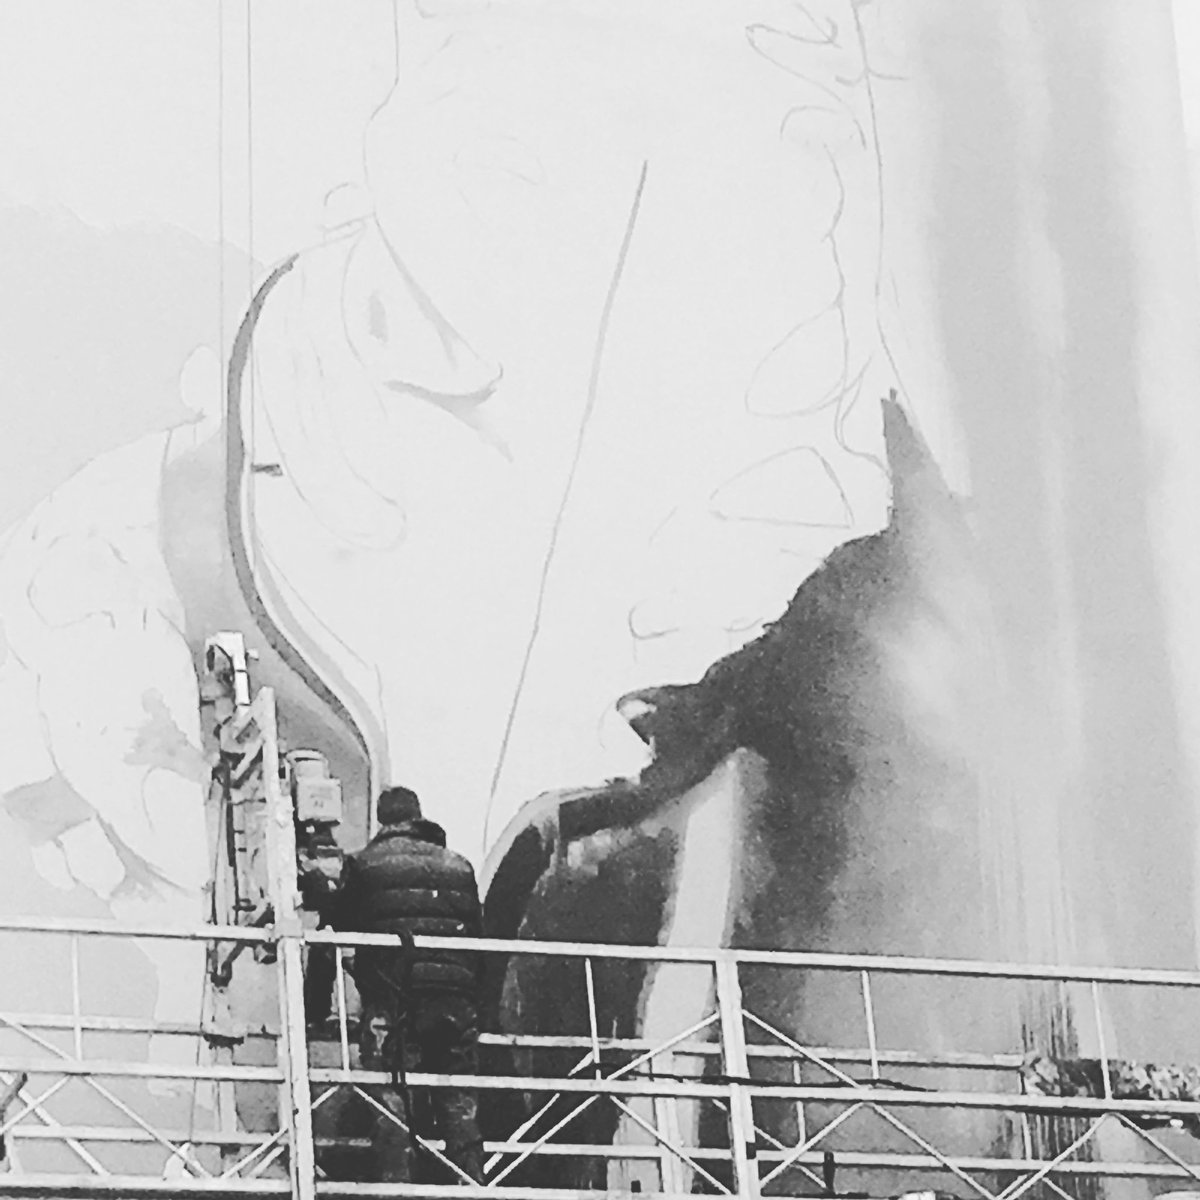 Work in progress #conorharrington #paris13  #urbanart #arturbain #streetart  #muralism #streep @Streepart @g_itinerrance #streetart13<br>http://pic.twitter.com/THLklxAqUb